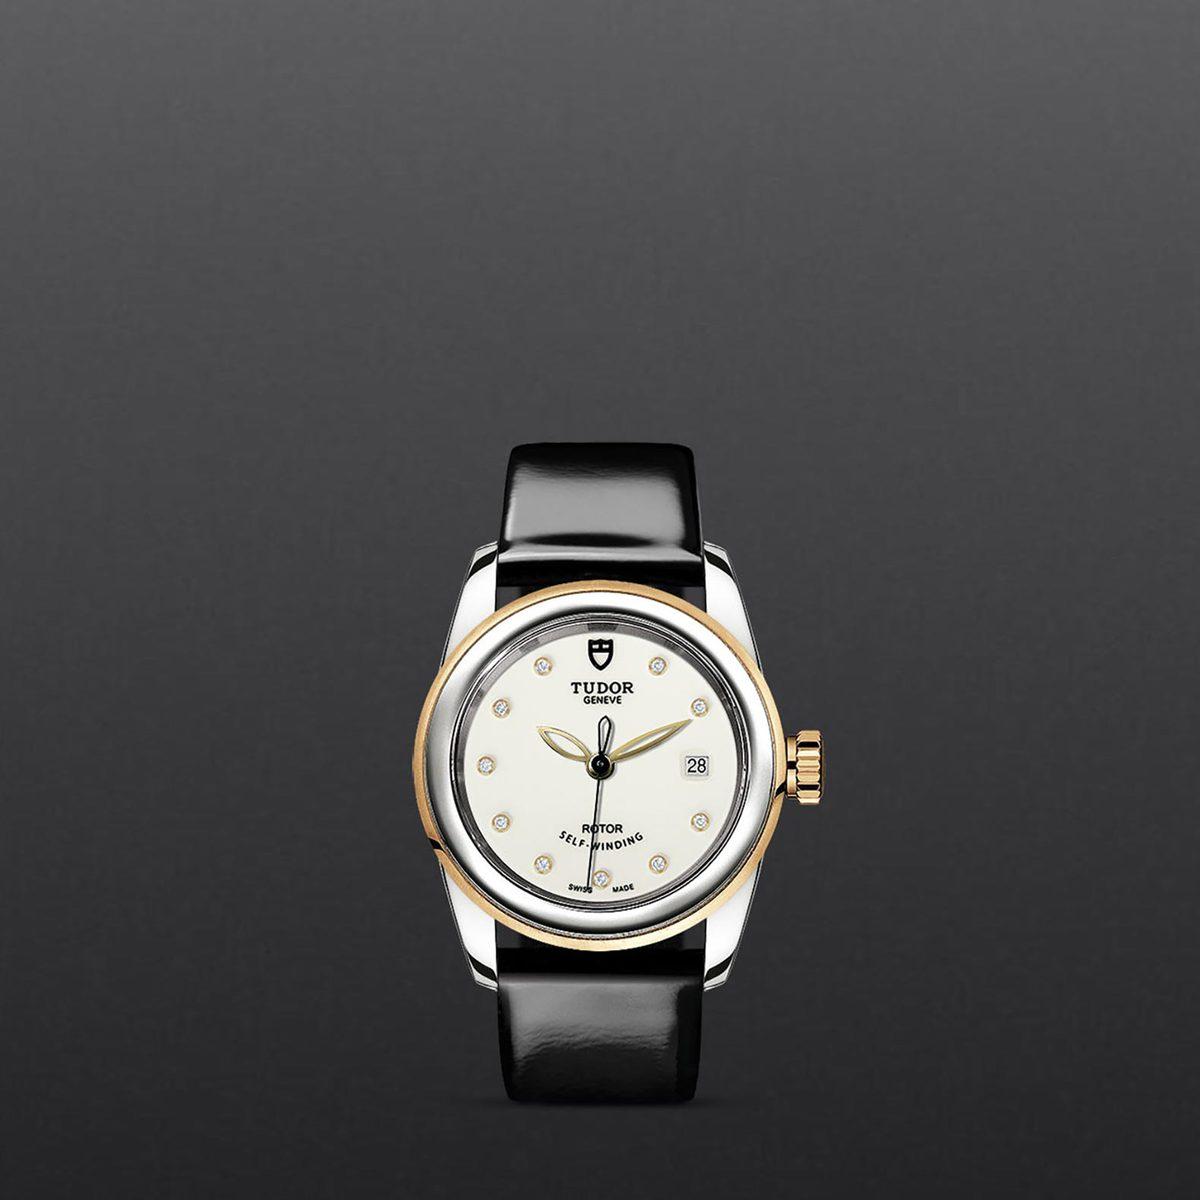 Tudor Glamour Date M51003-0028